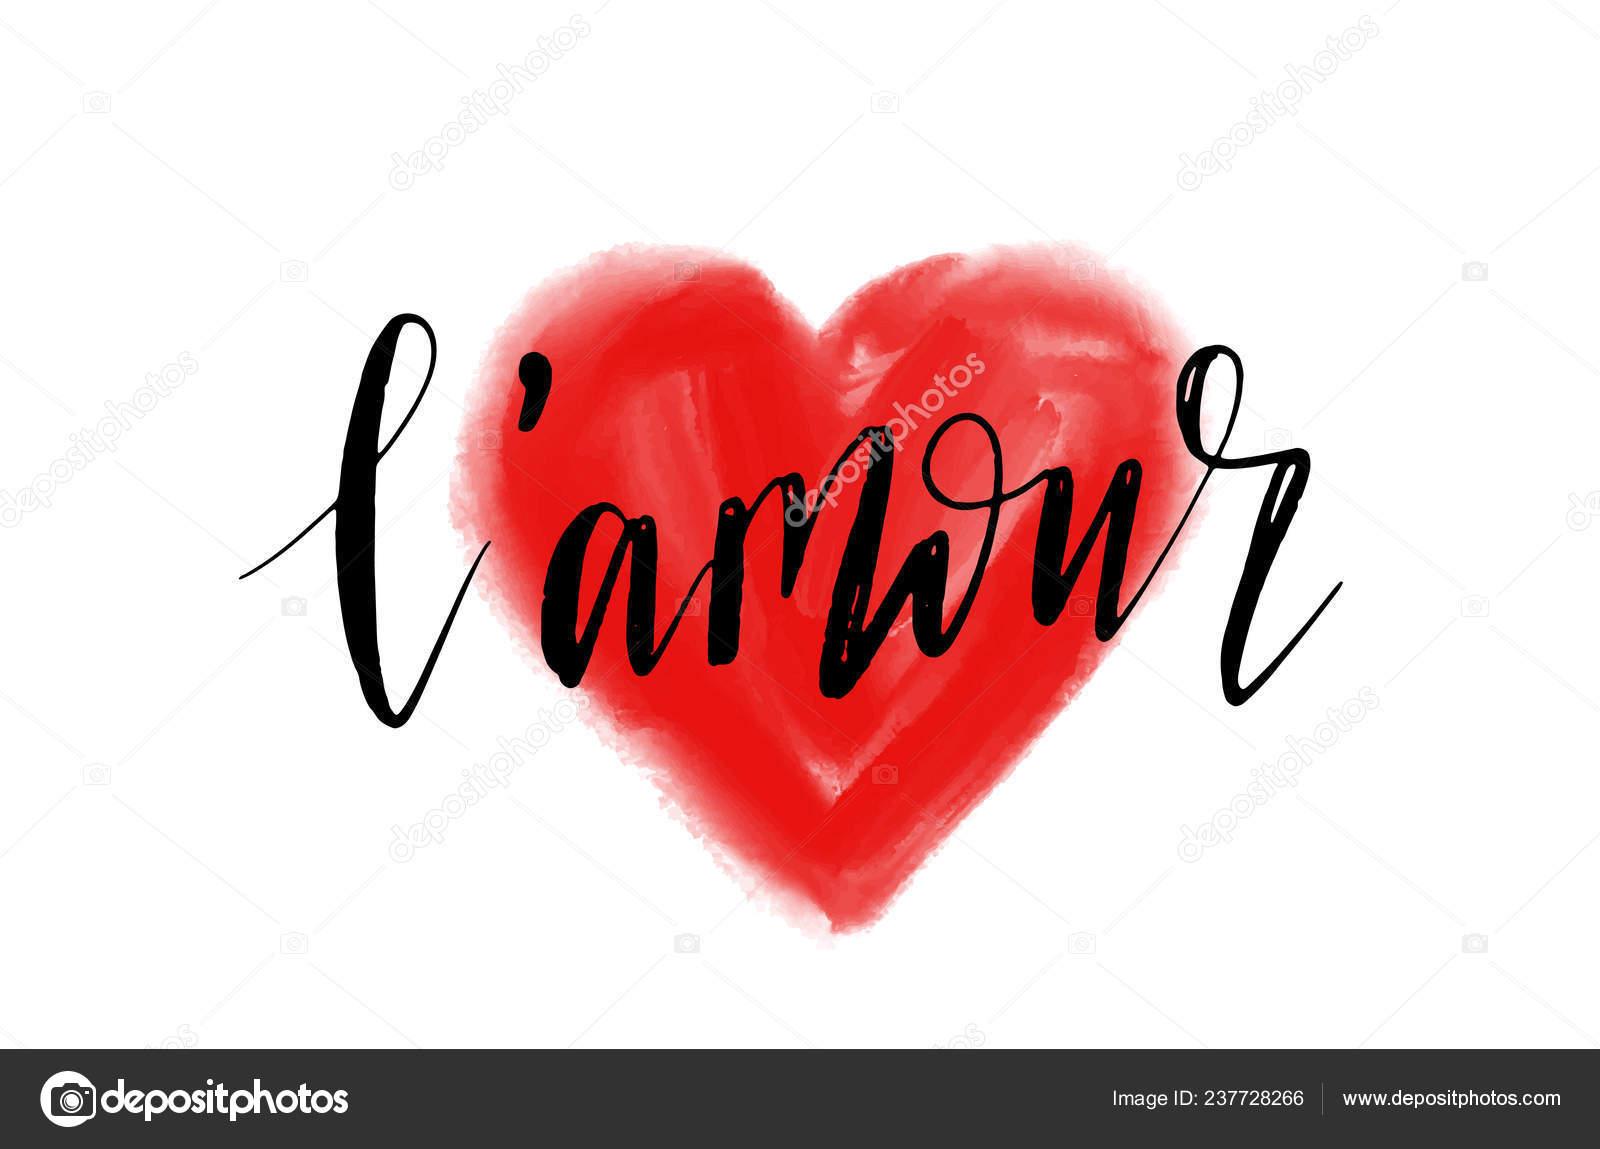 Diseño Tarjeta Amour Letras Palabra Amor Francés Cepillo